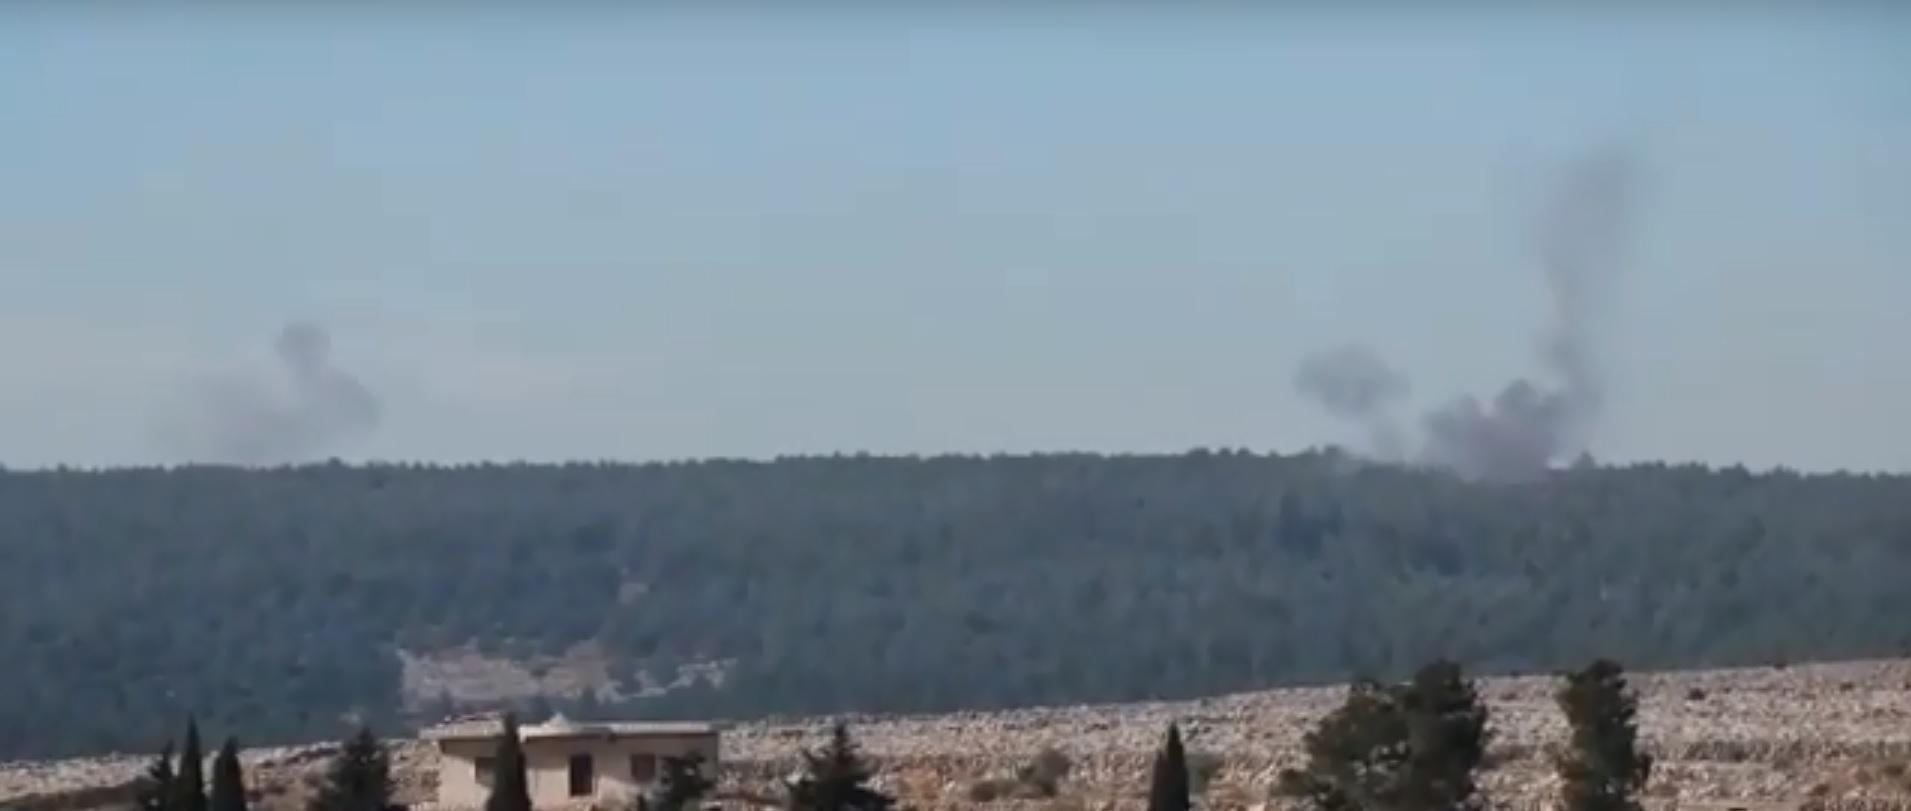 Photo of بعد مجزرة تل رفعت.. الاحتلال يواصل قصف قرى الشهباء وشيراوا وشرا